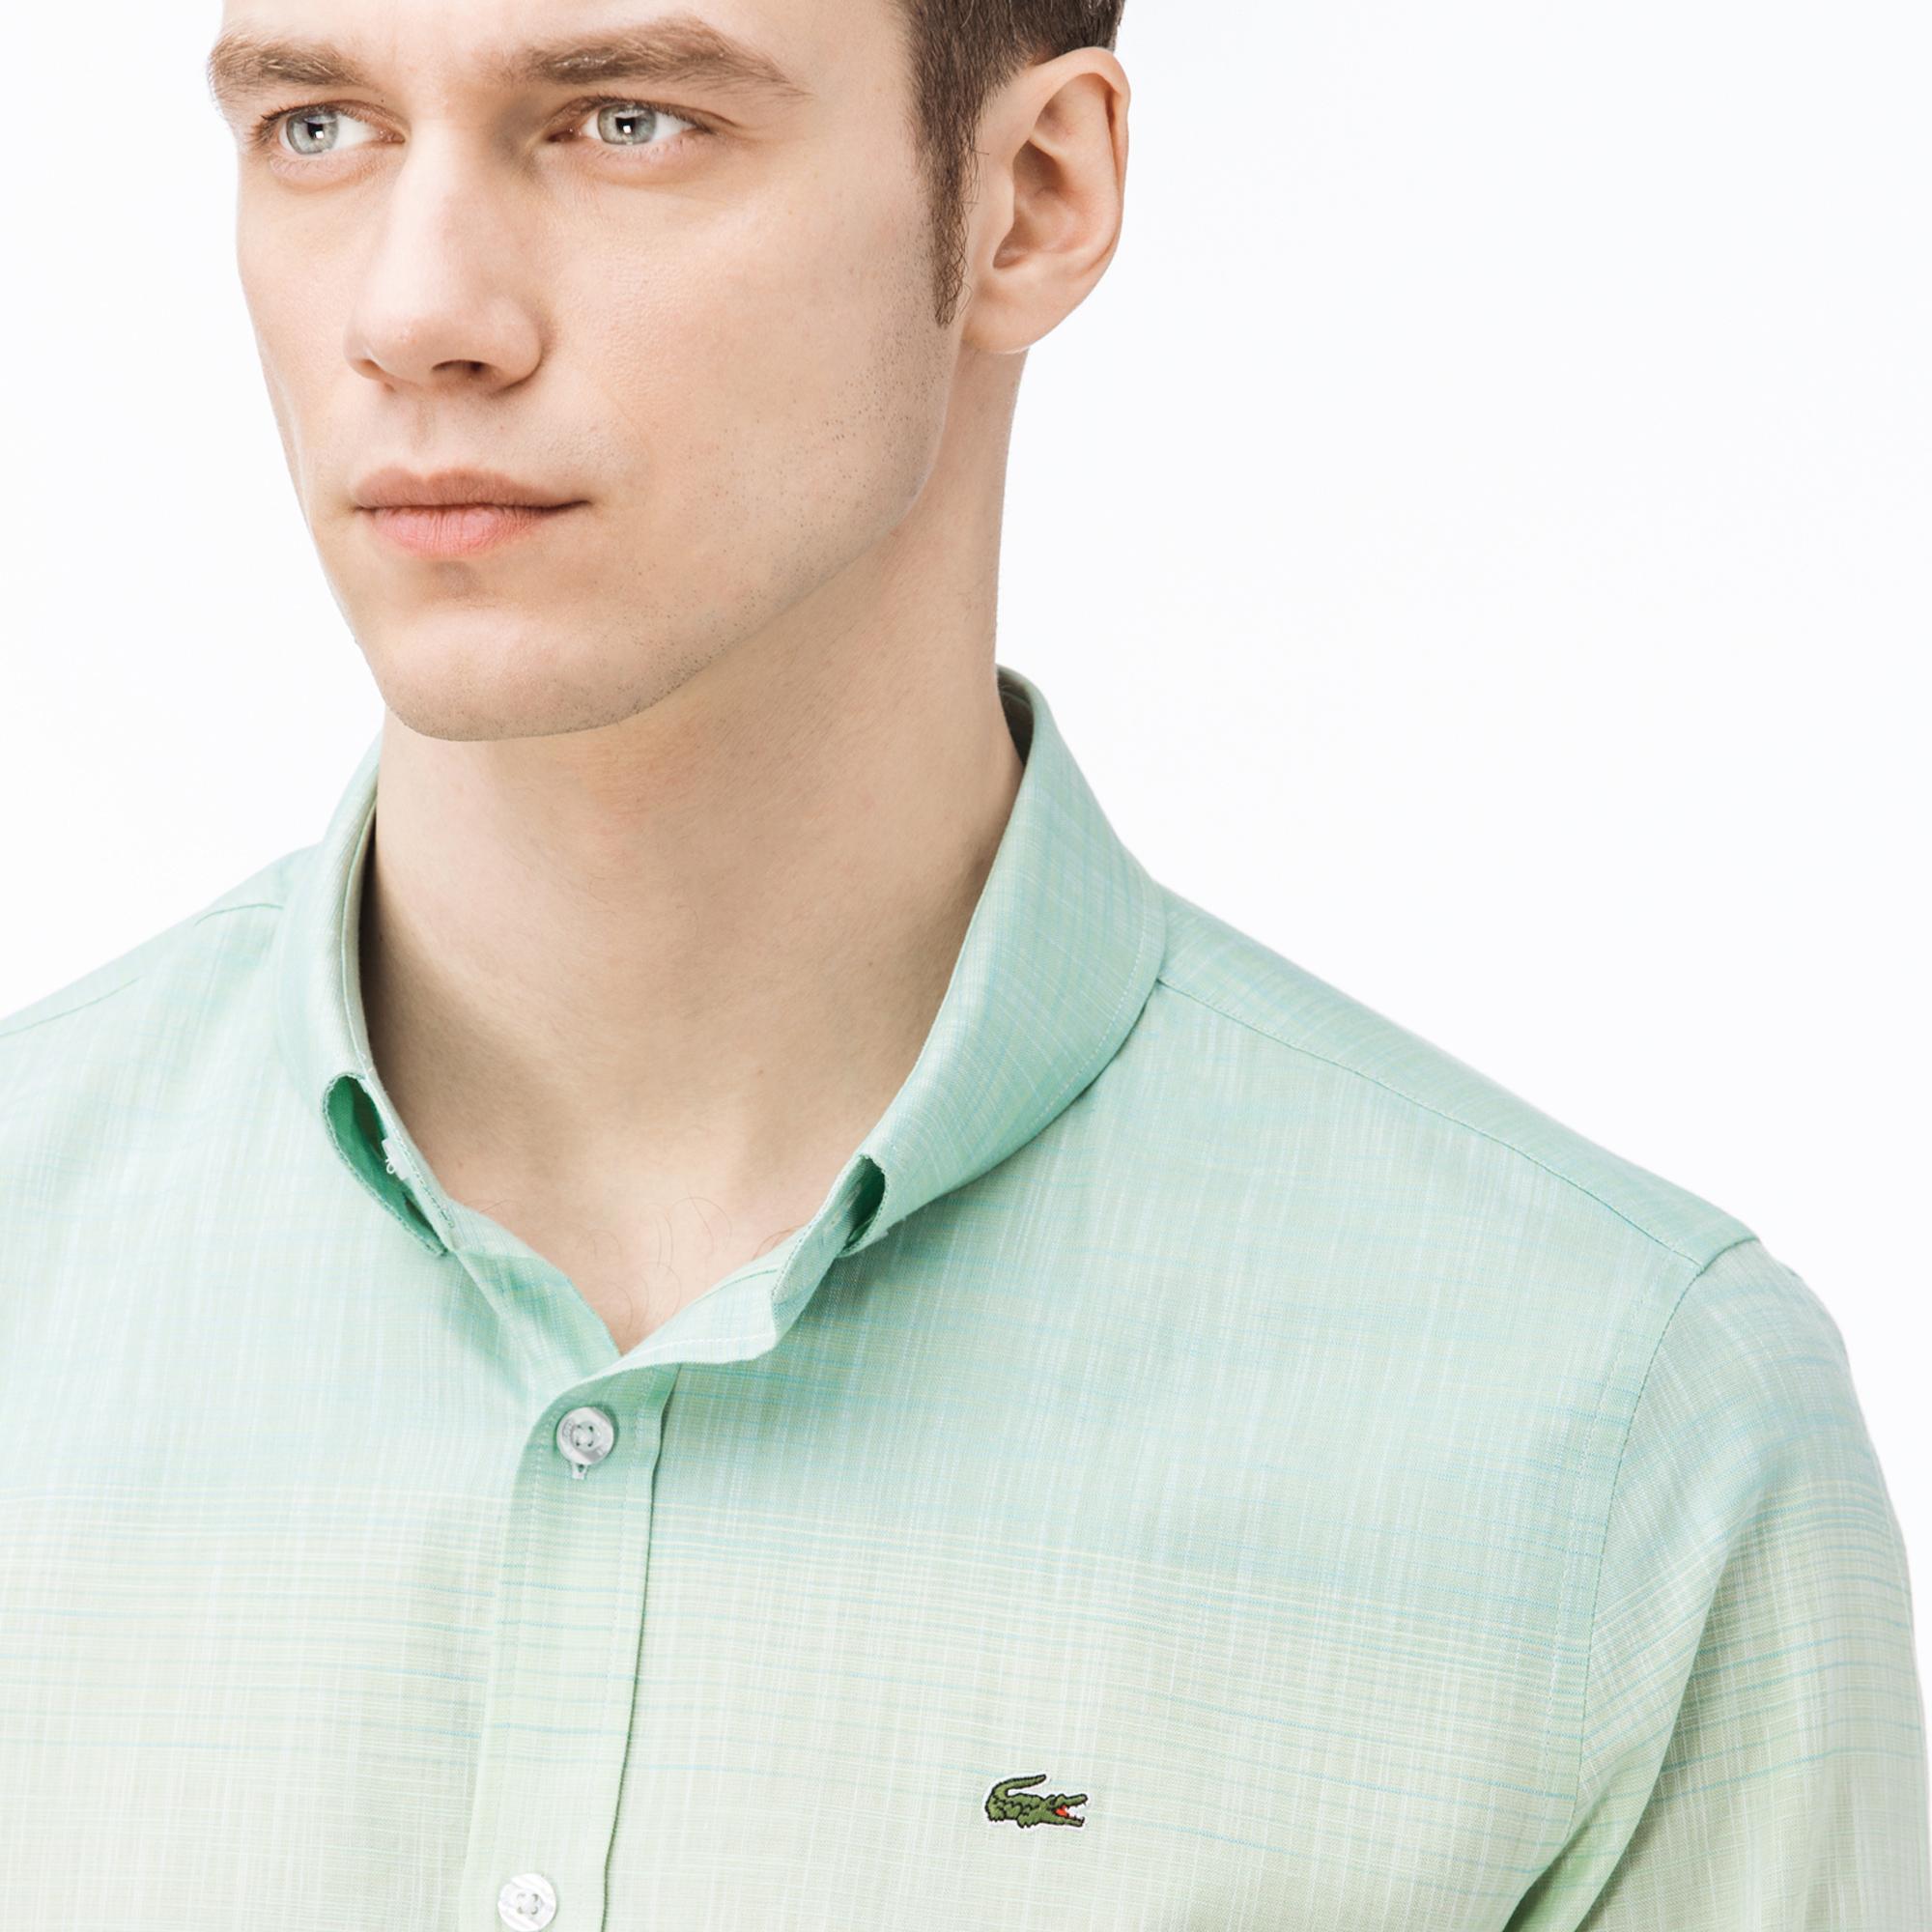 b3068a4896219 Lacoste Erkek Slim Fit Degrade Gömlek CH0924-24Y